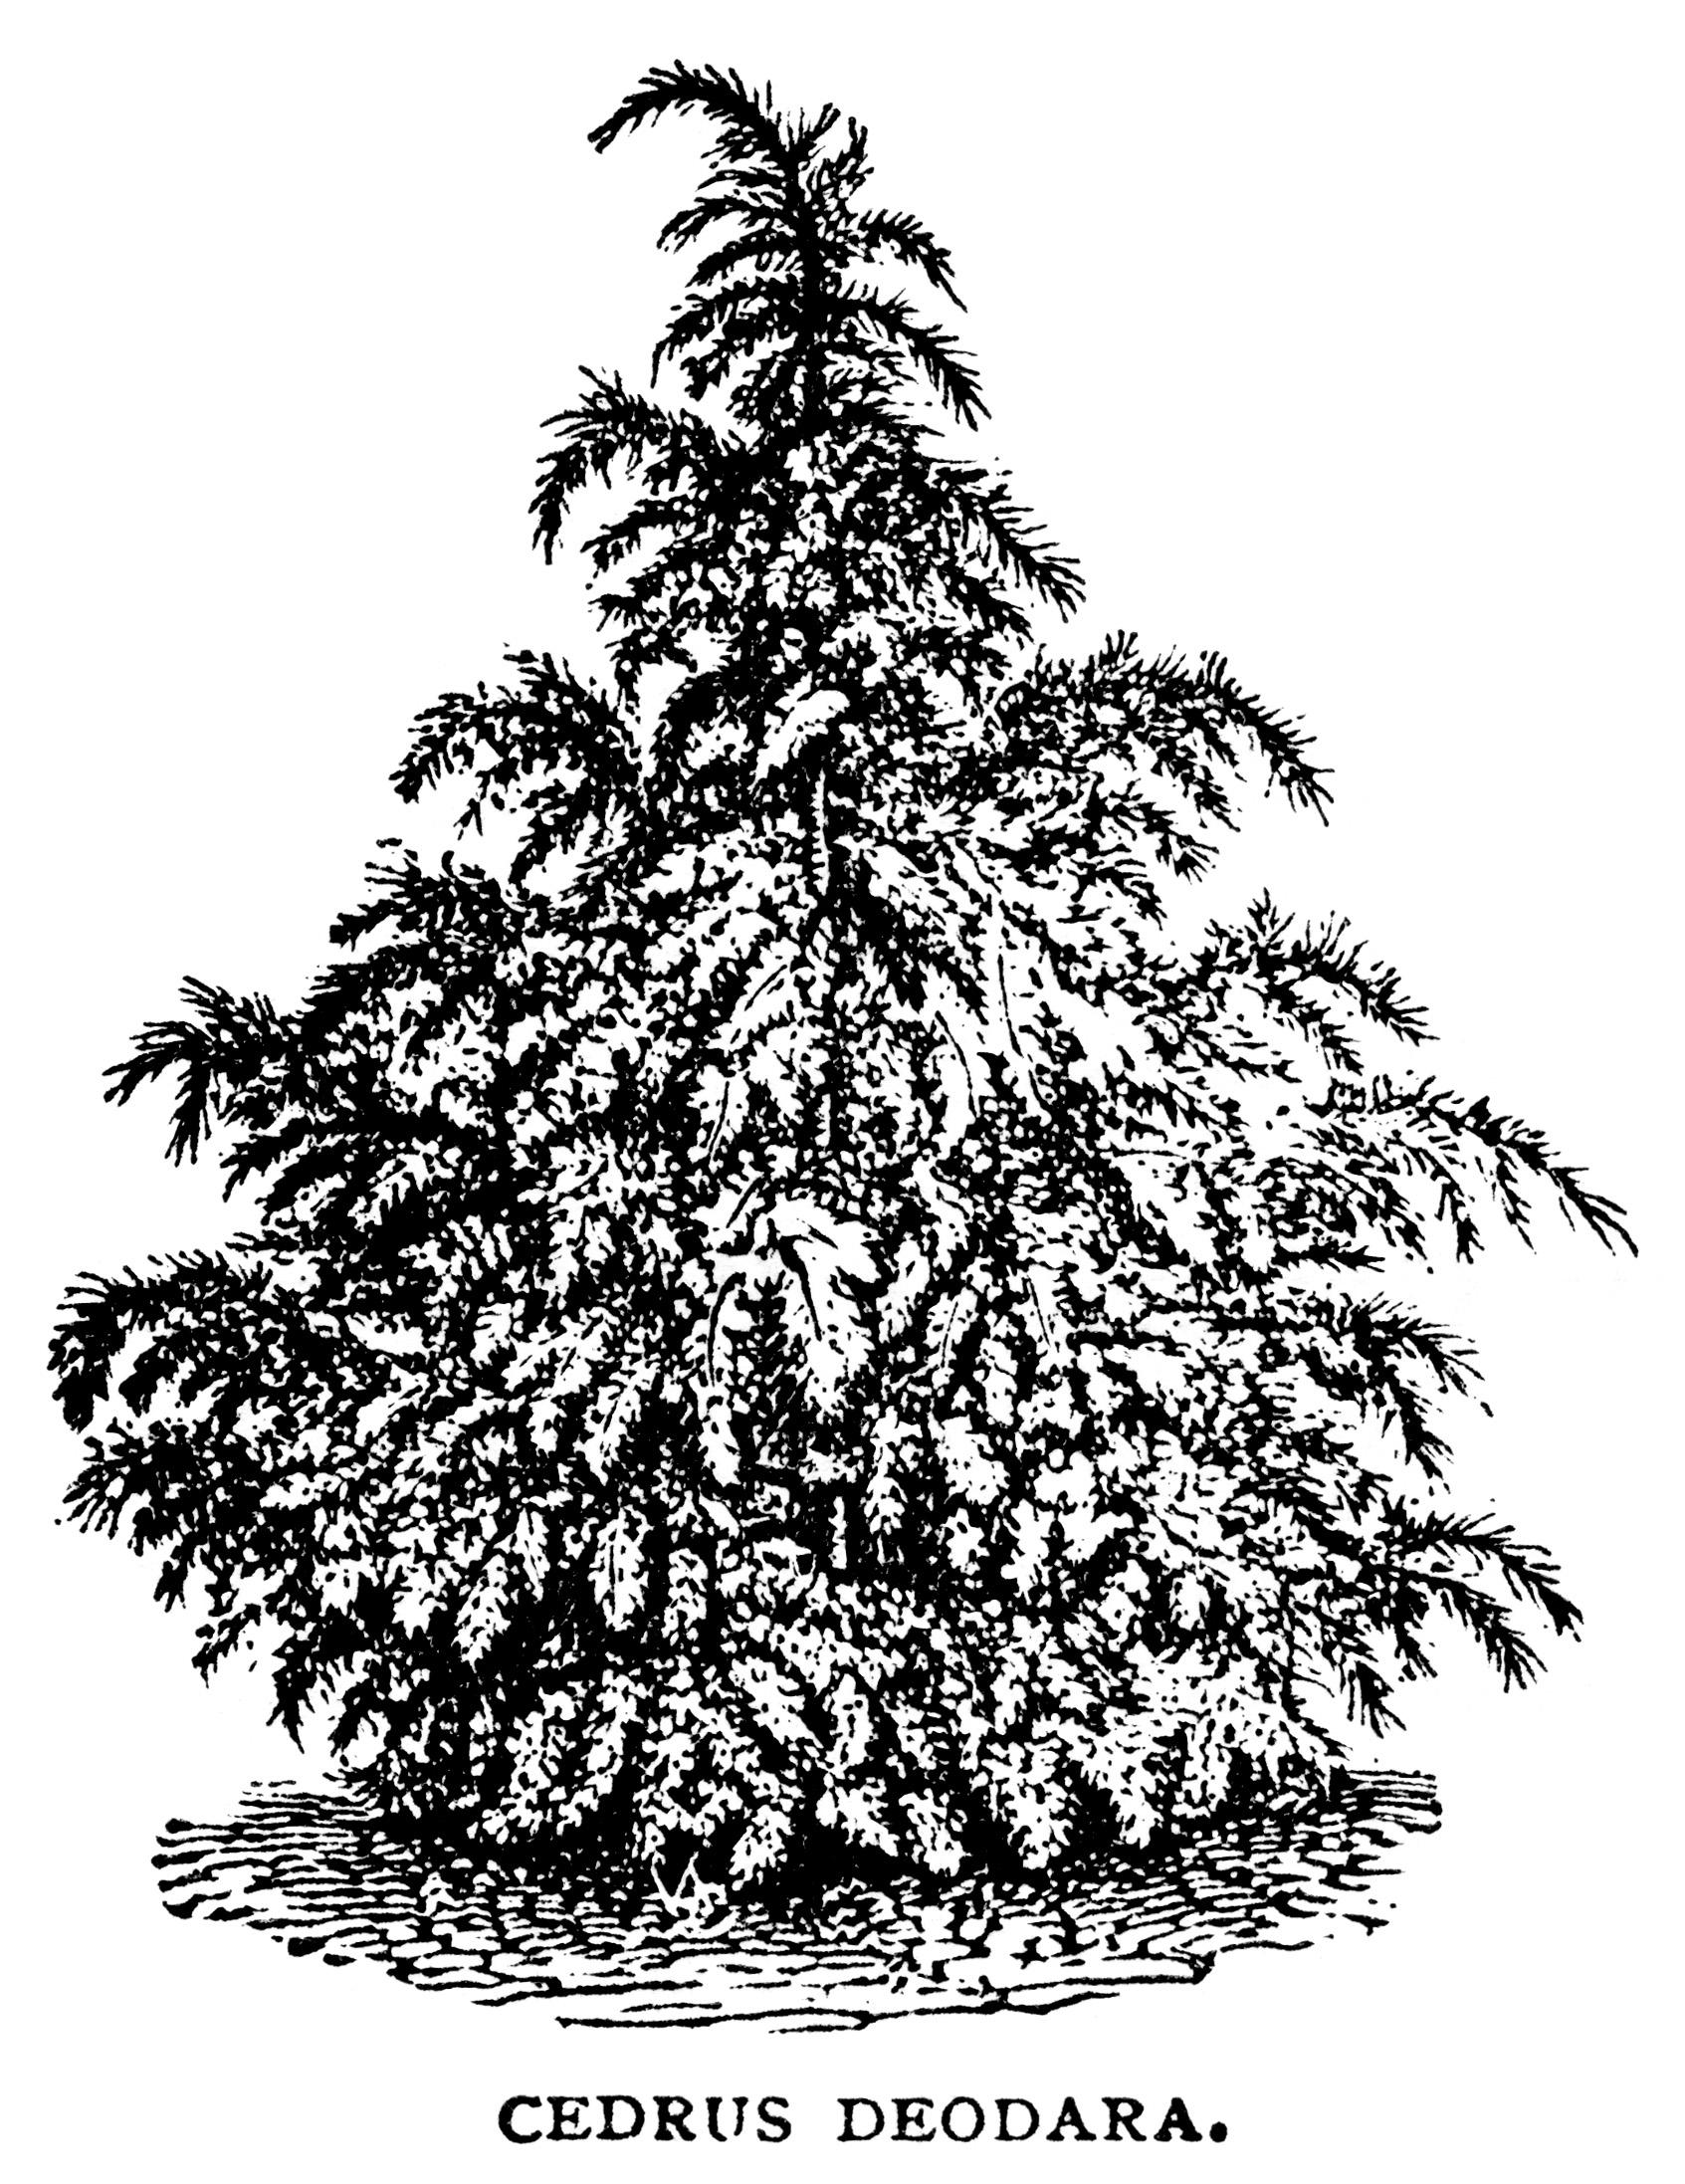 black and white graphics, botanical spruce tree illustration.